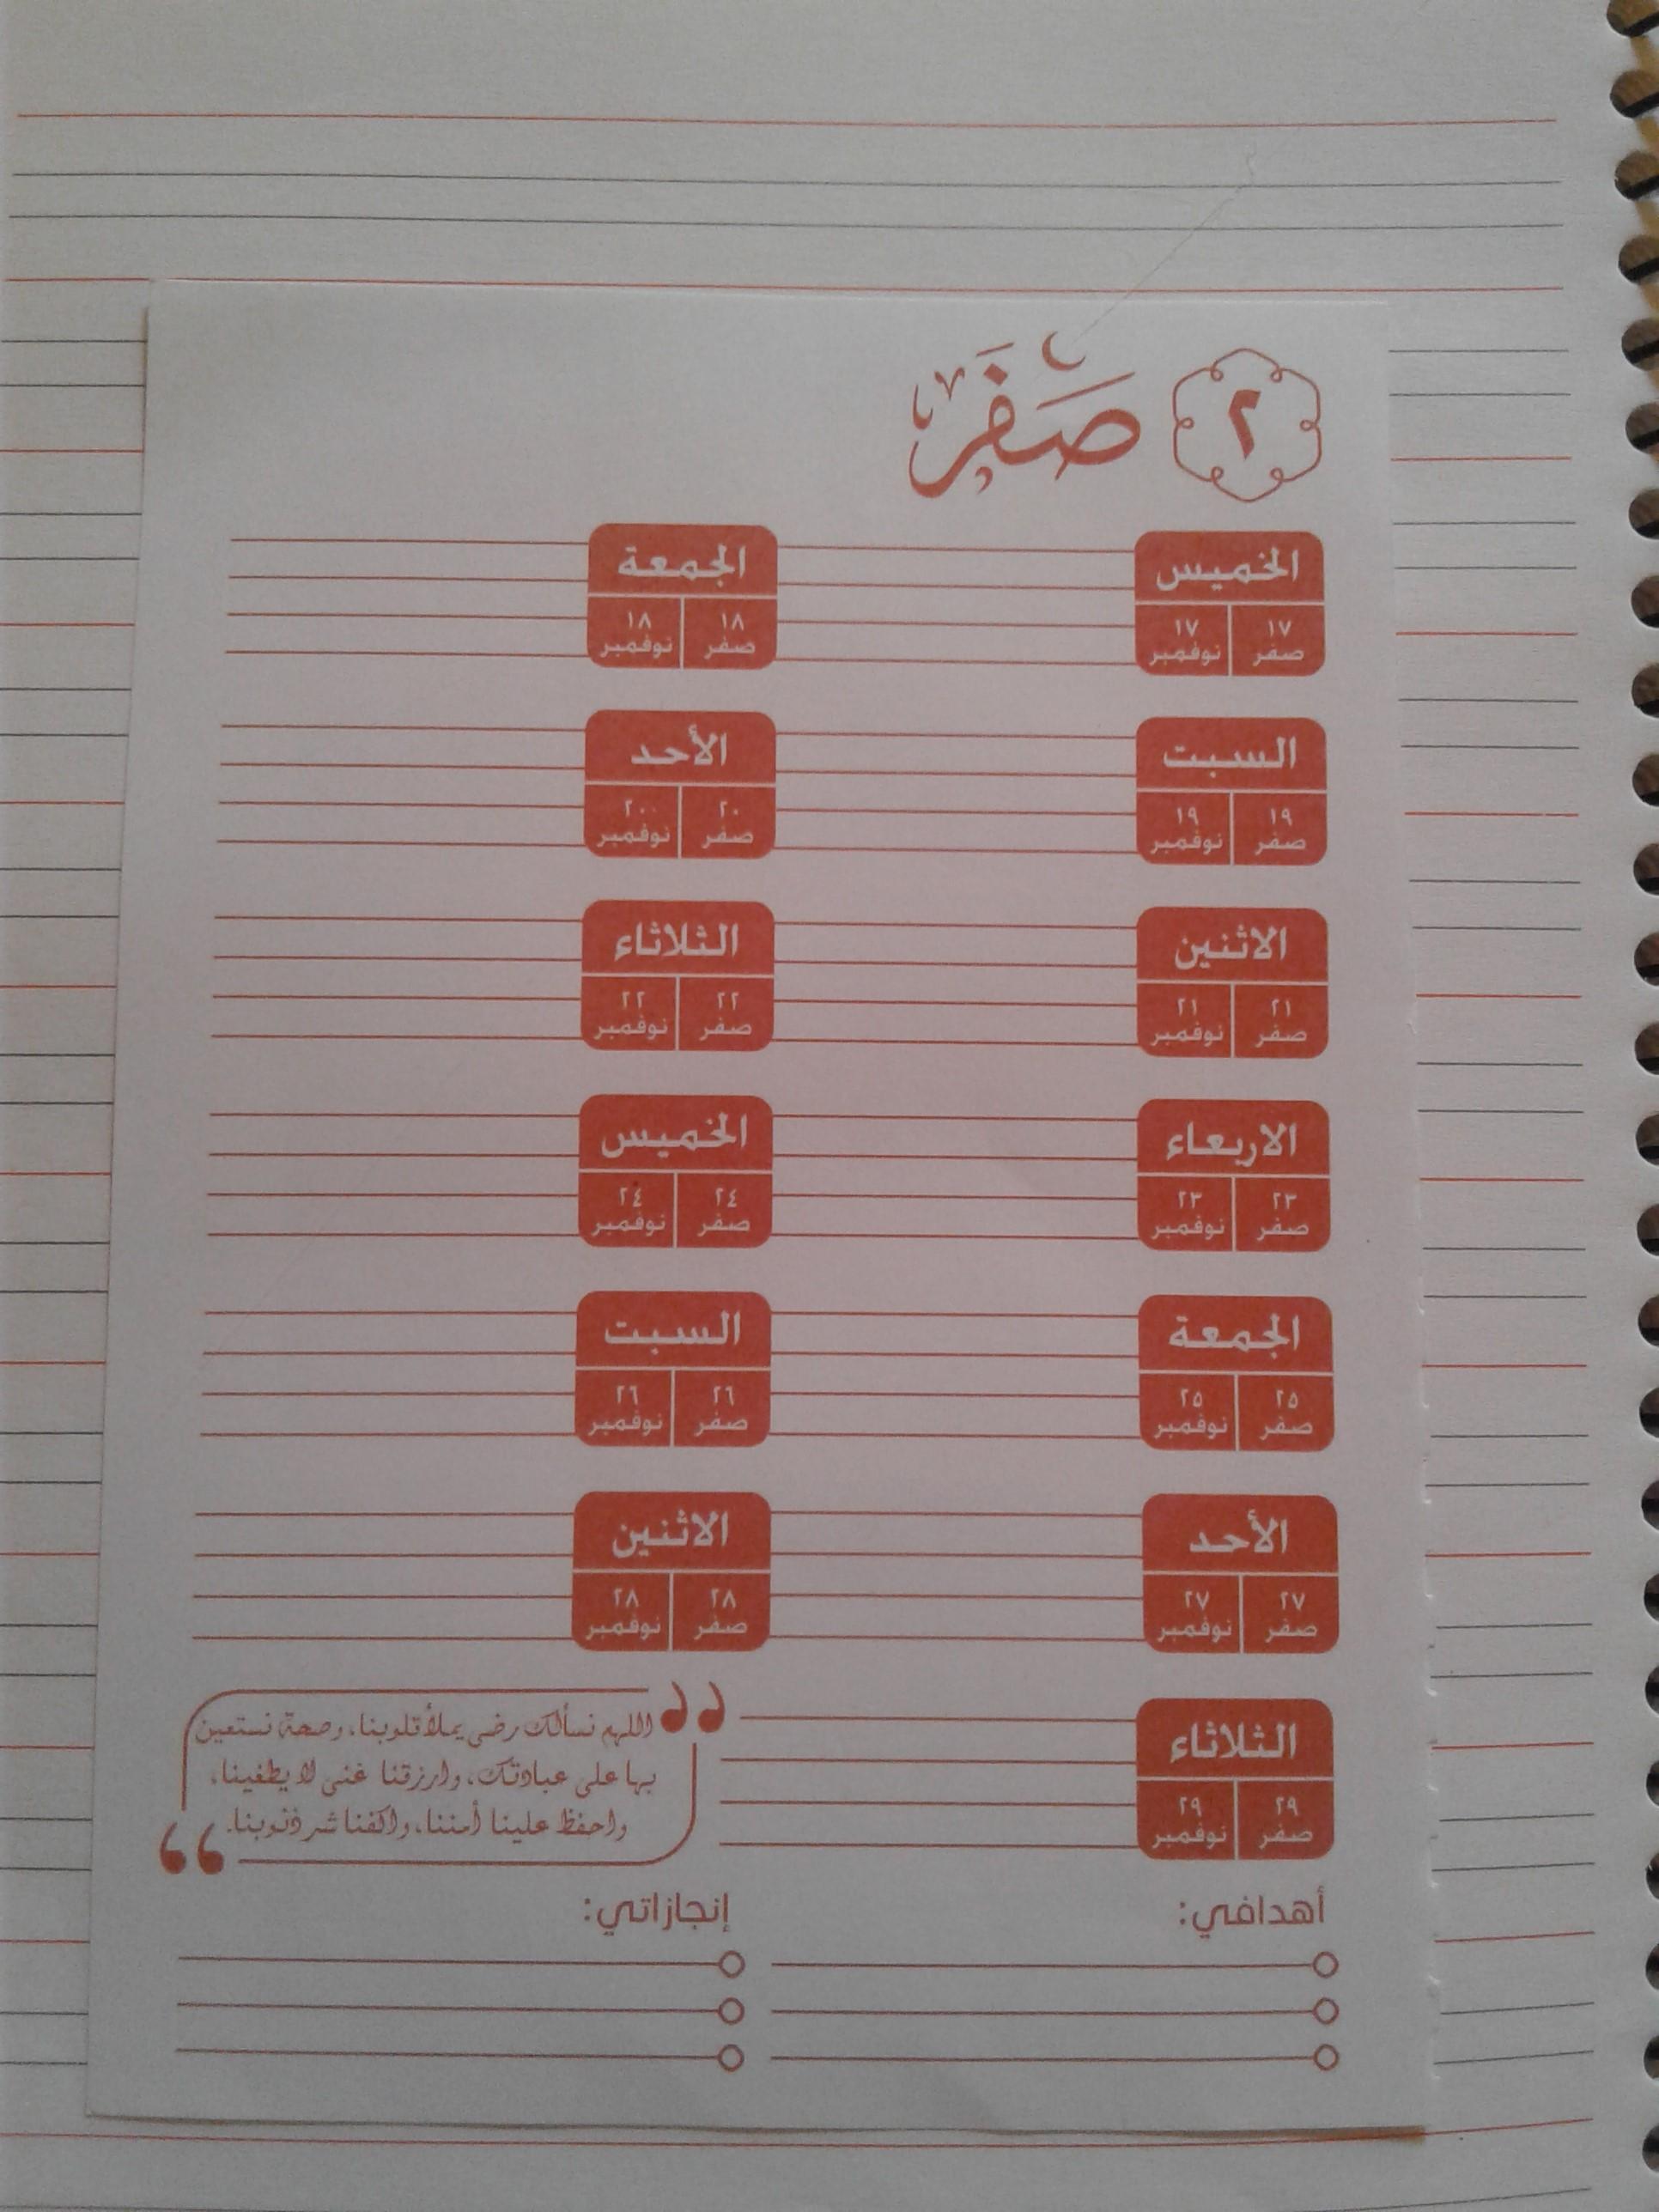 akhawat_islamway_1504360626___.jpg